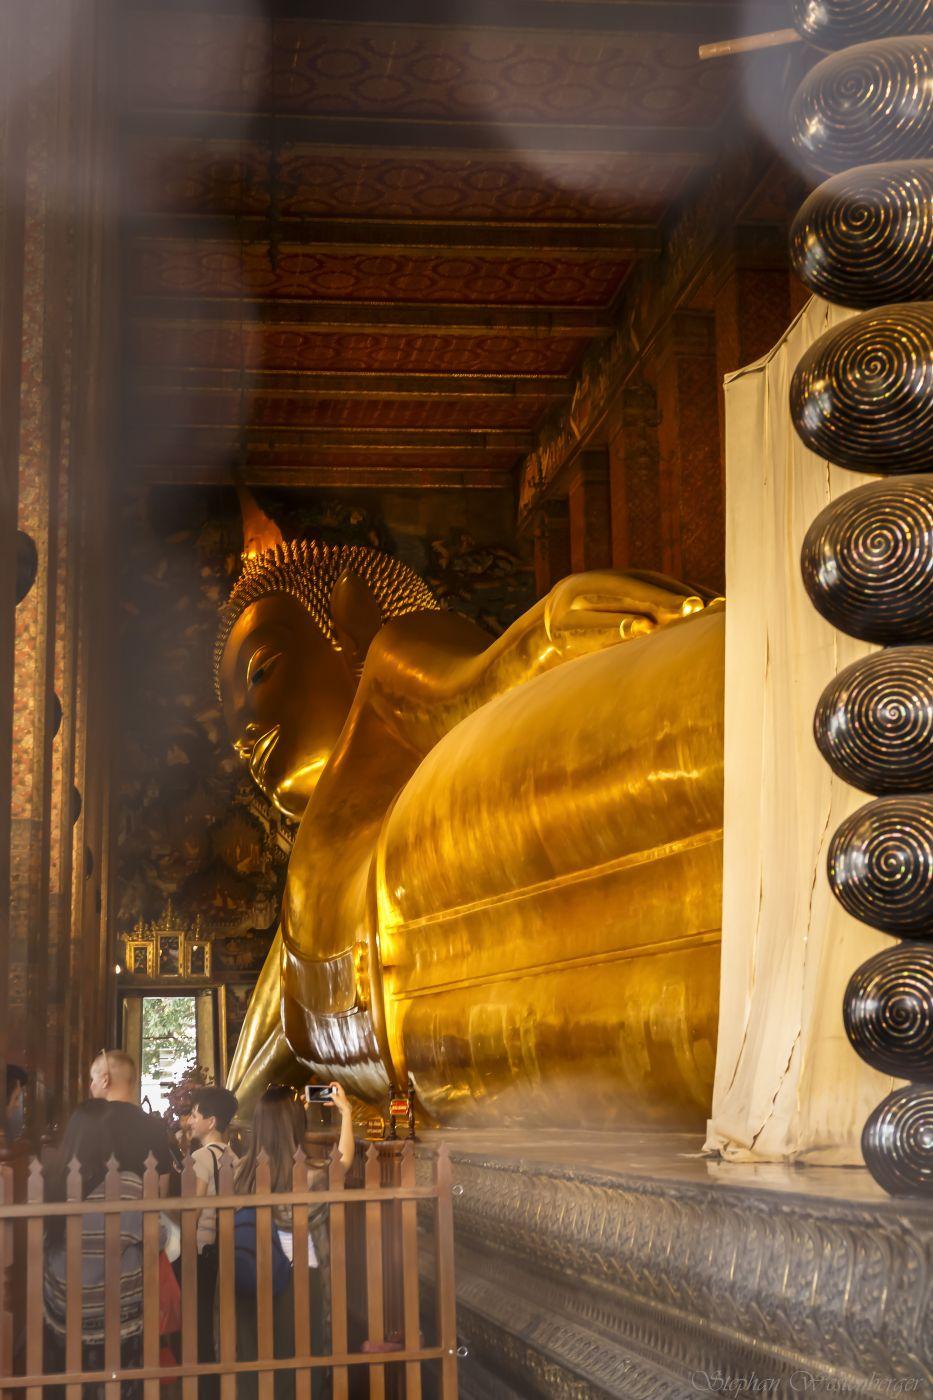 Wat Pho (Lying Buddha), Thailand